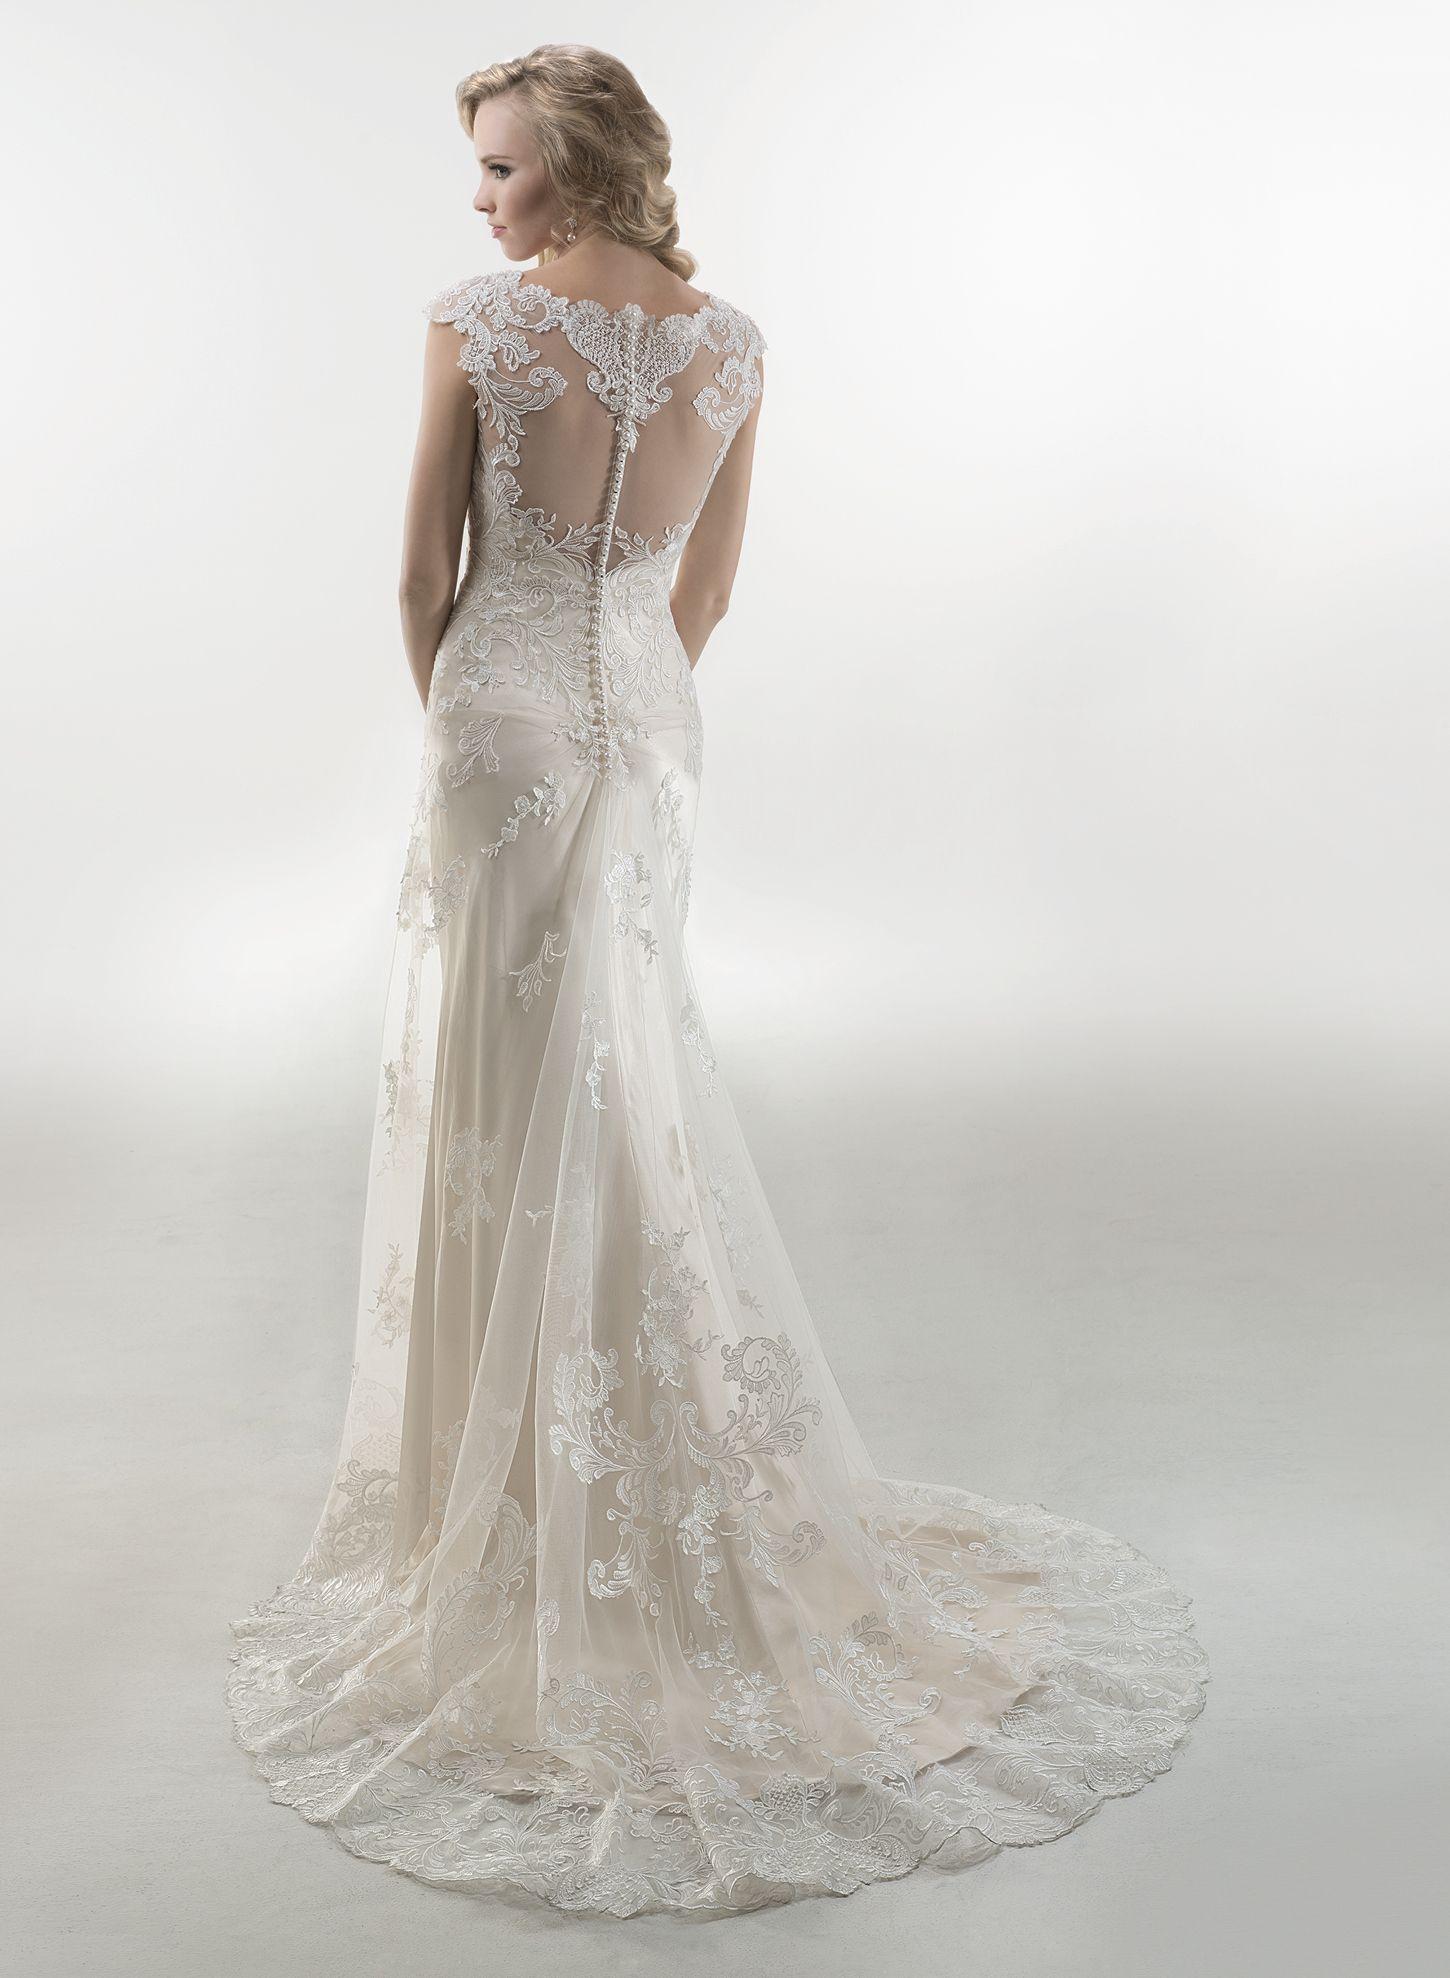 Wedding dress slip  Francesca  Maggie Sottero  Pinterest  Maggie sottero Couture